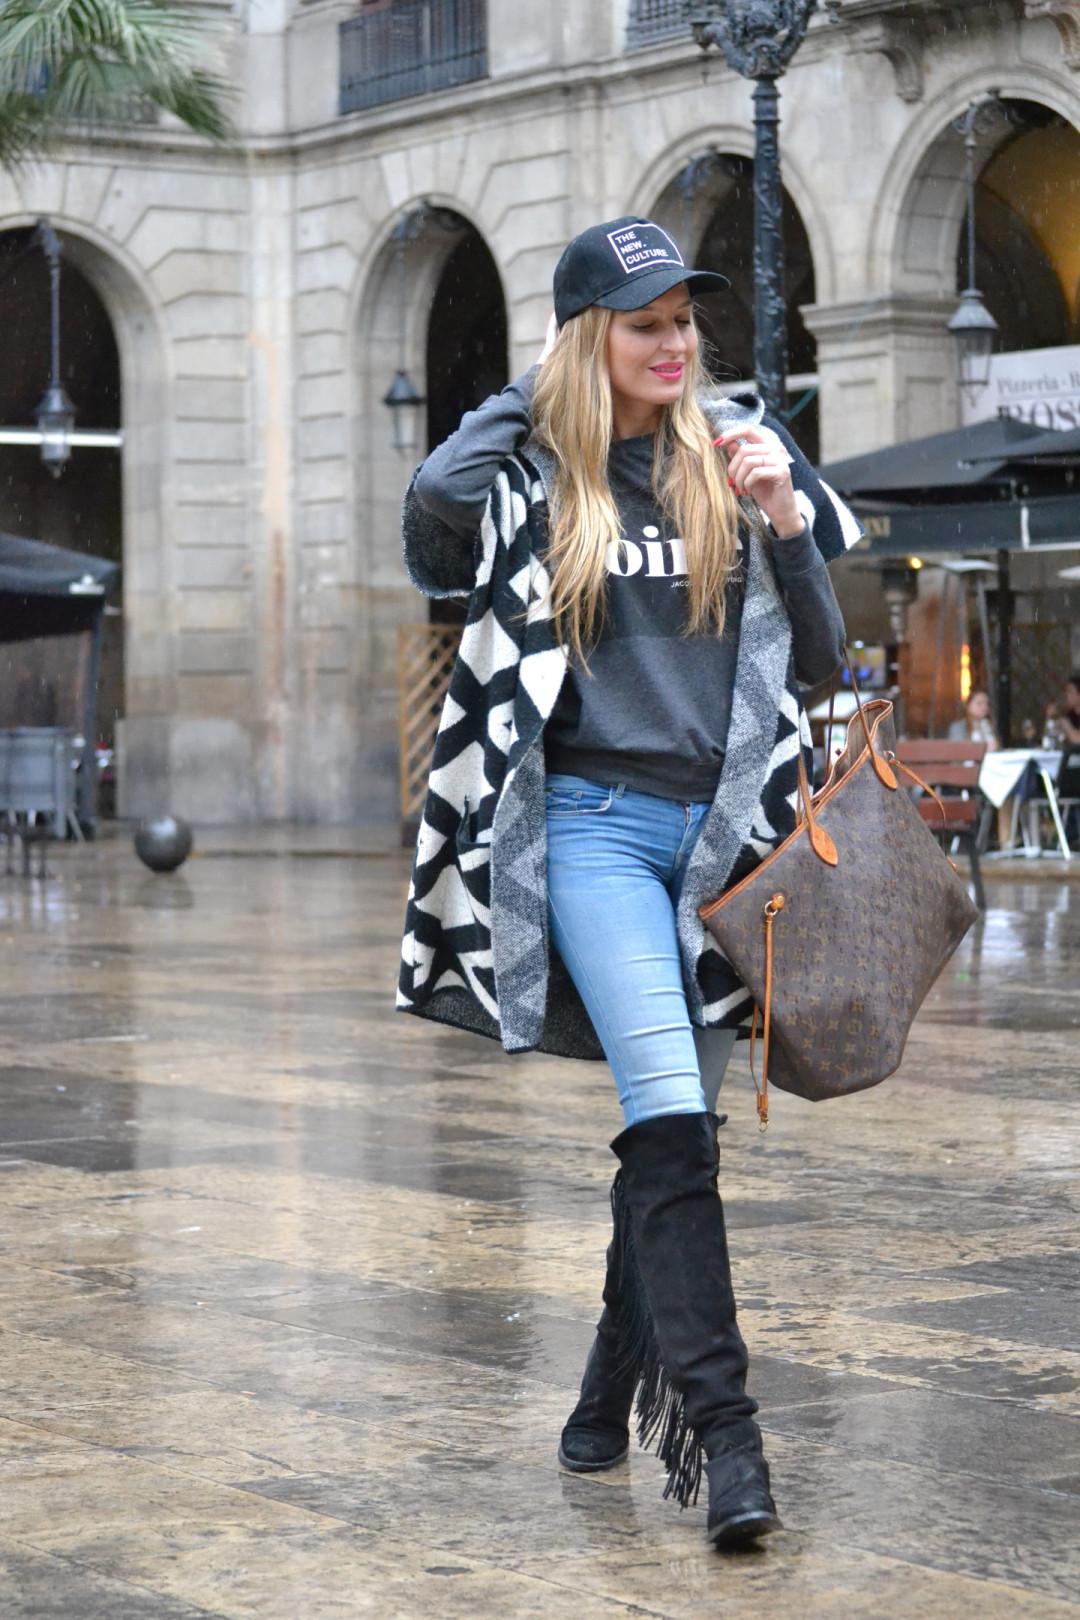 Pilar_Burgos_Botas_Flecos_Louis_Vuitton_Neverfull_Bymyheels_Salsa_Jeans_Lara_Martin_Gilarranz_Oxygene_Barcelona_Plaza_Real (6)